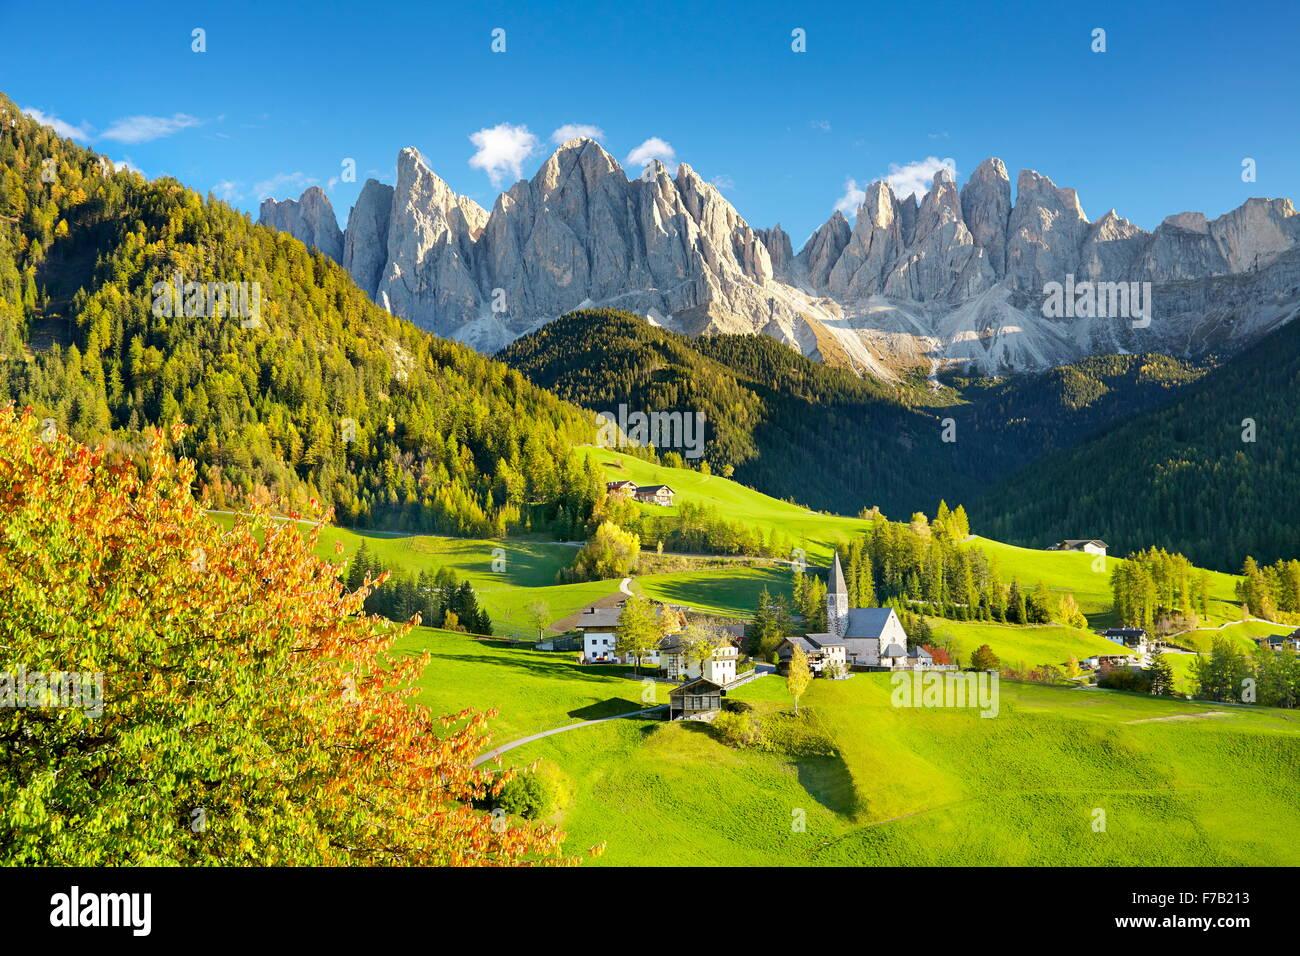 Dolomiten im Herbst - Santa Maddalena Village, Naturpark Puez Geisler, Alpen, Südtirol, Italien Stockbild